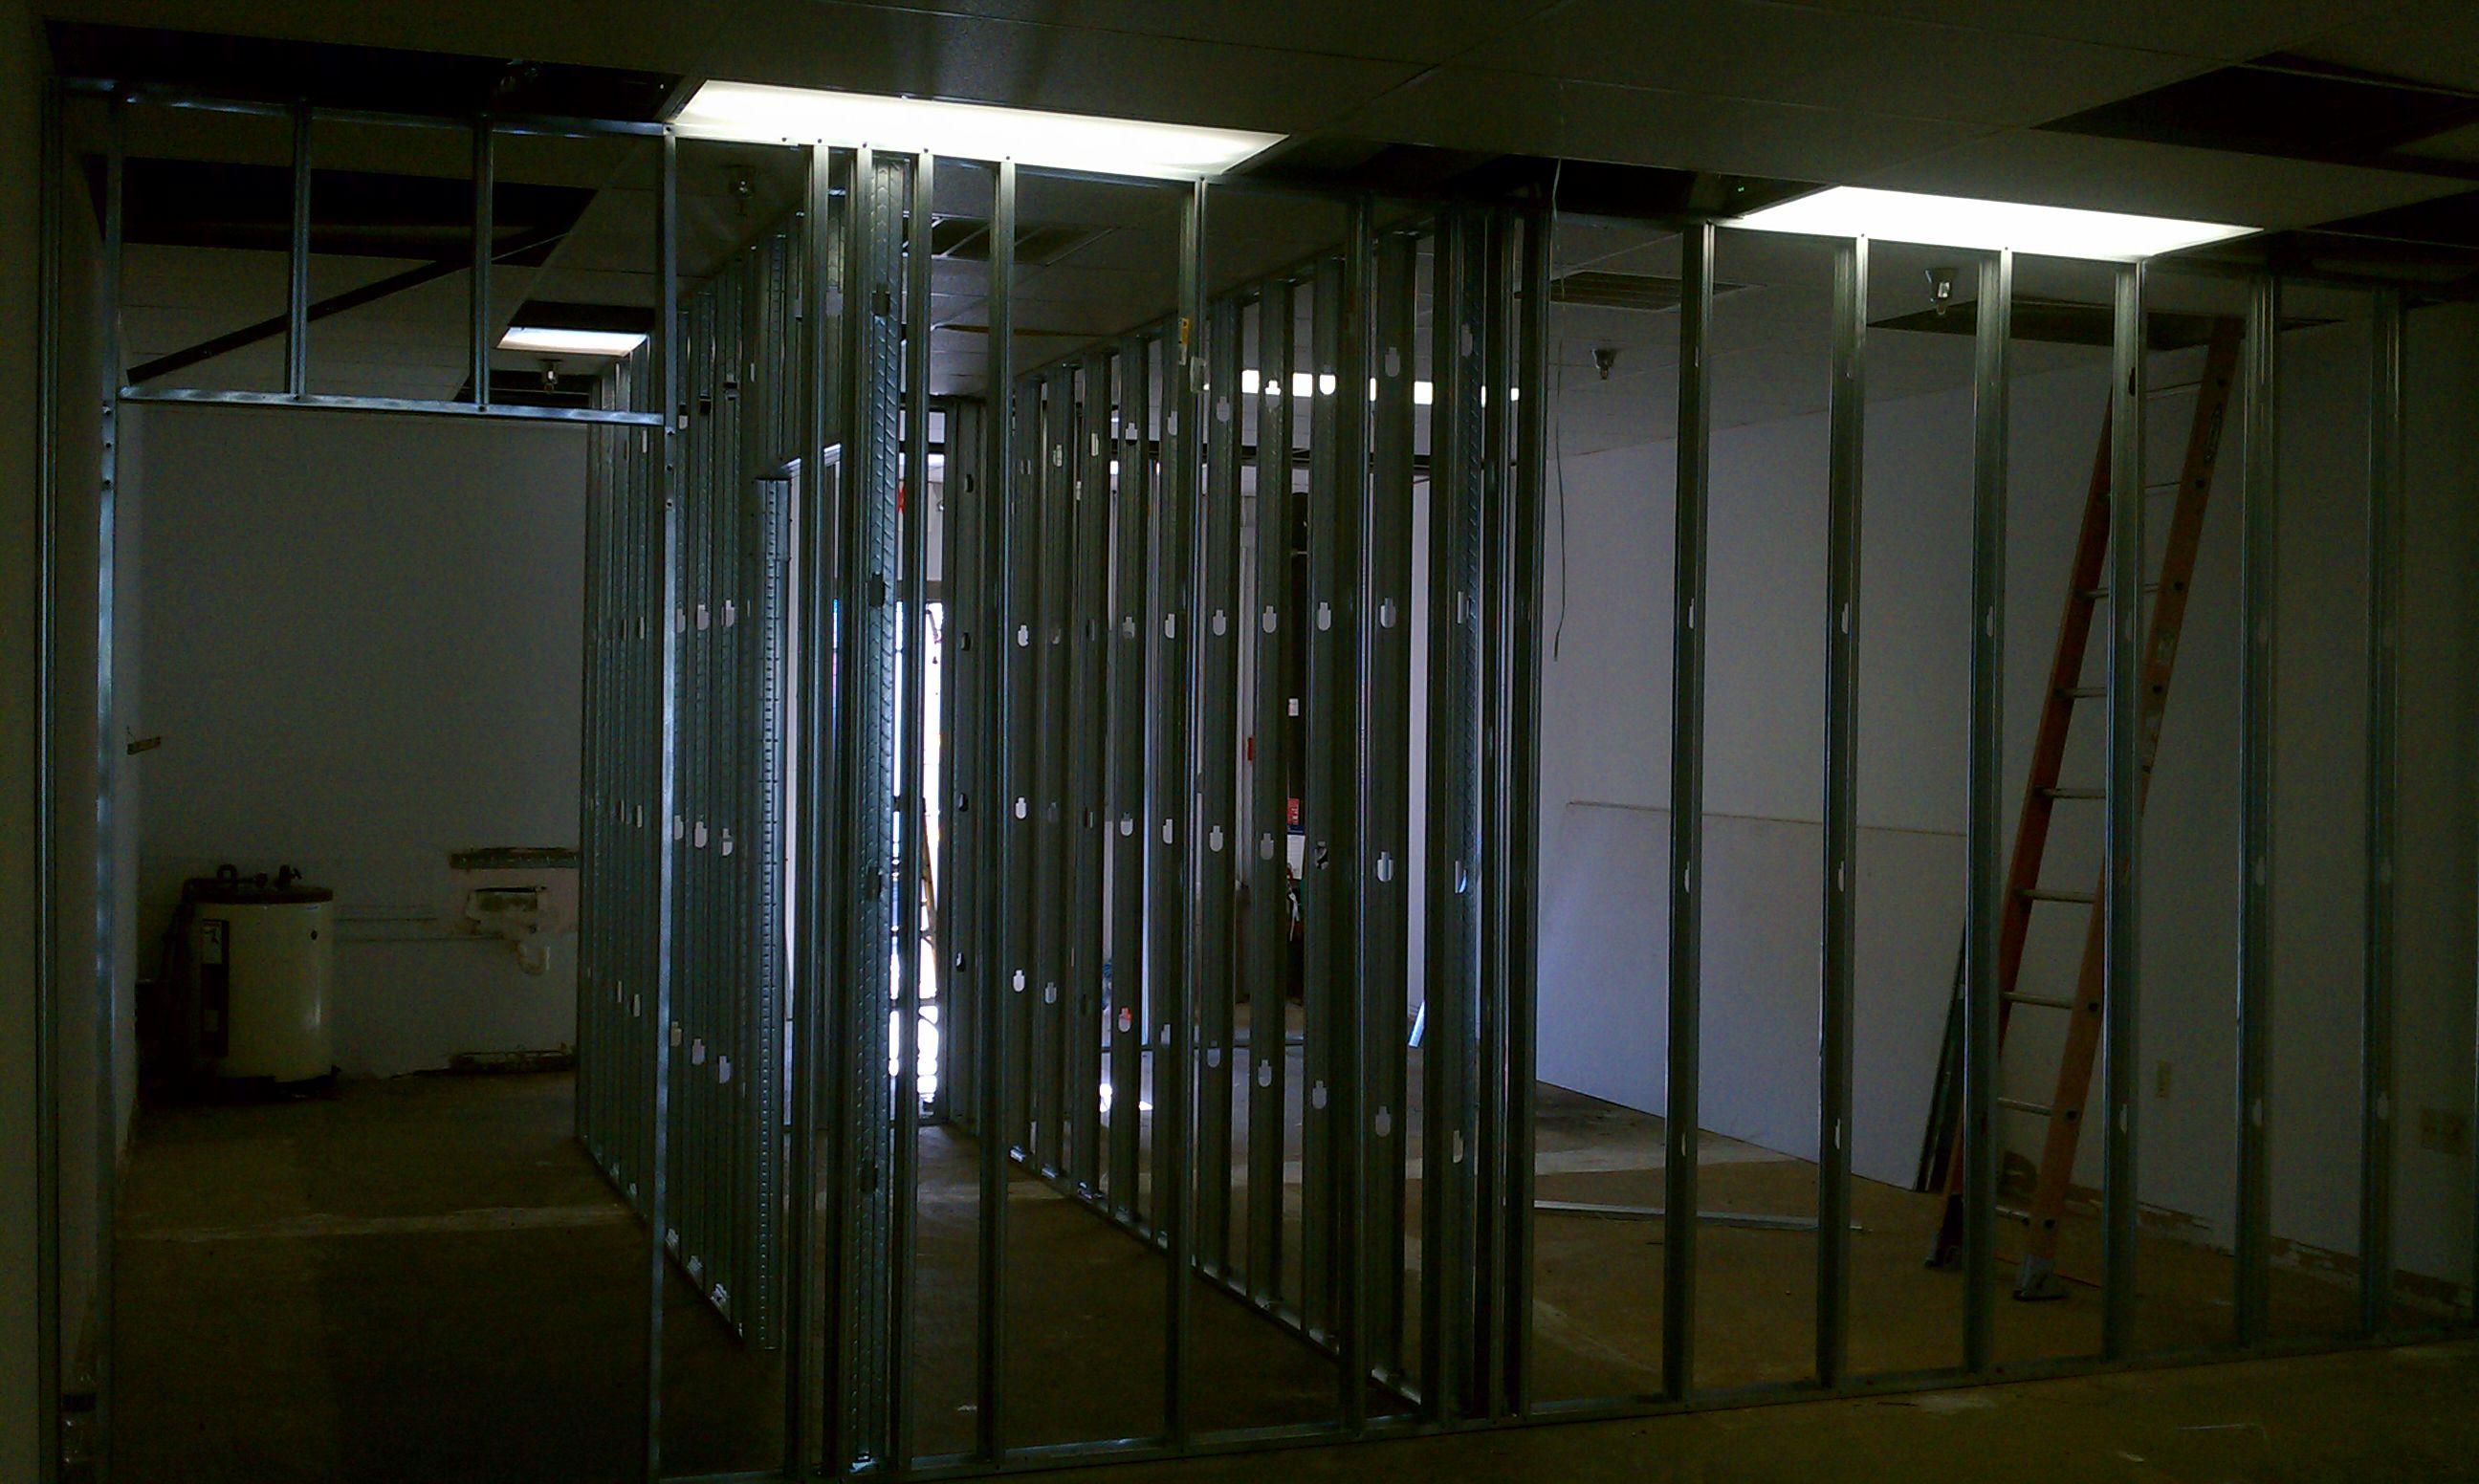 Commercial Remodeling